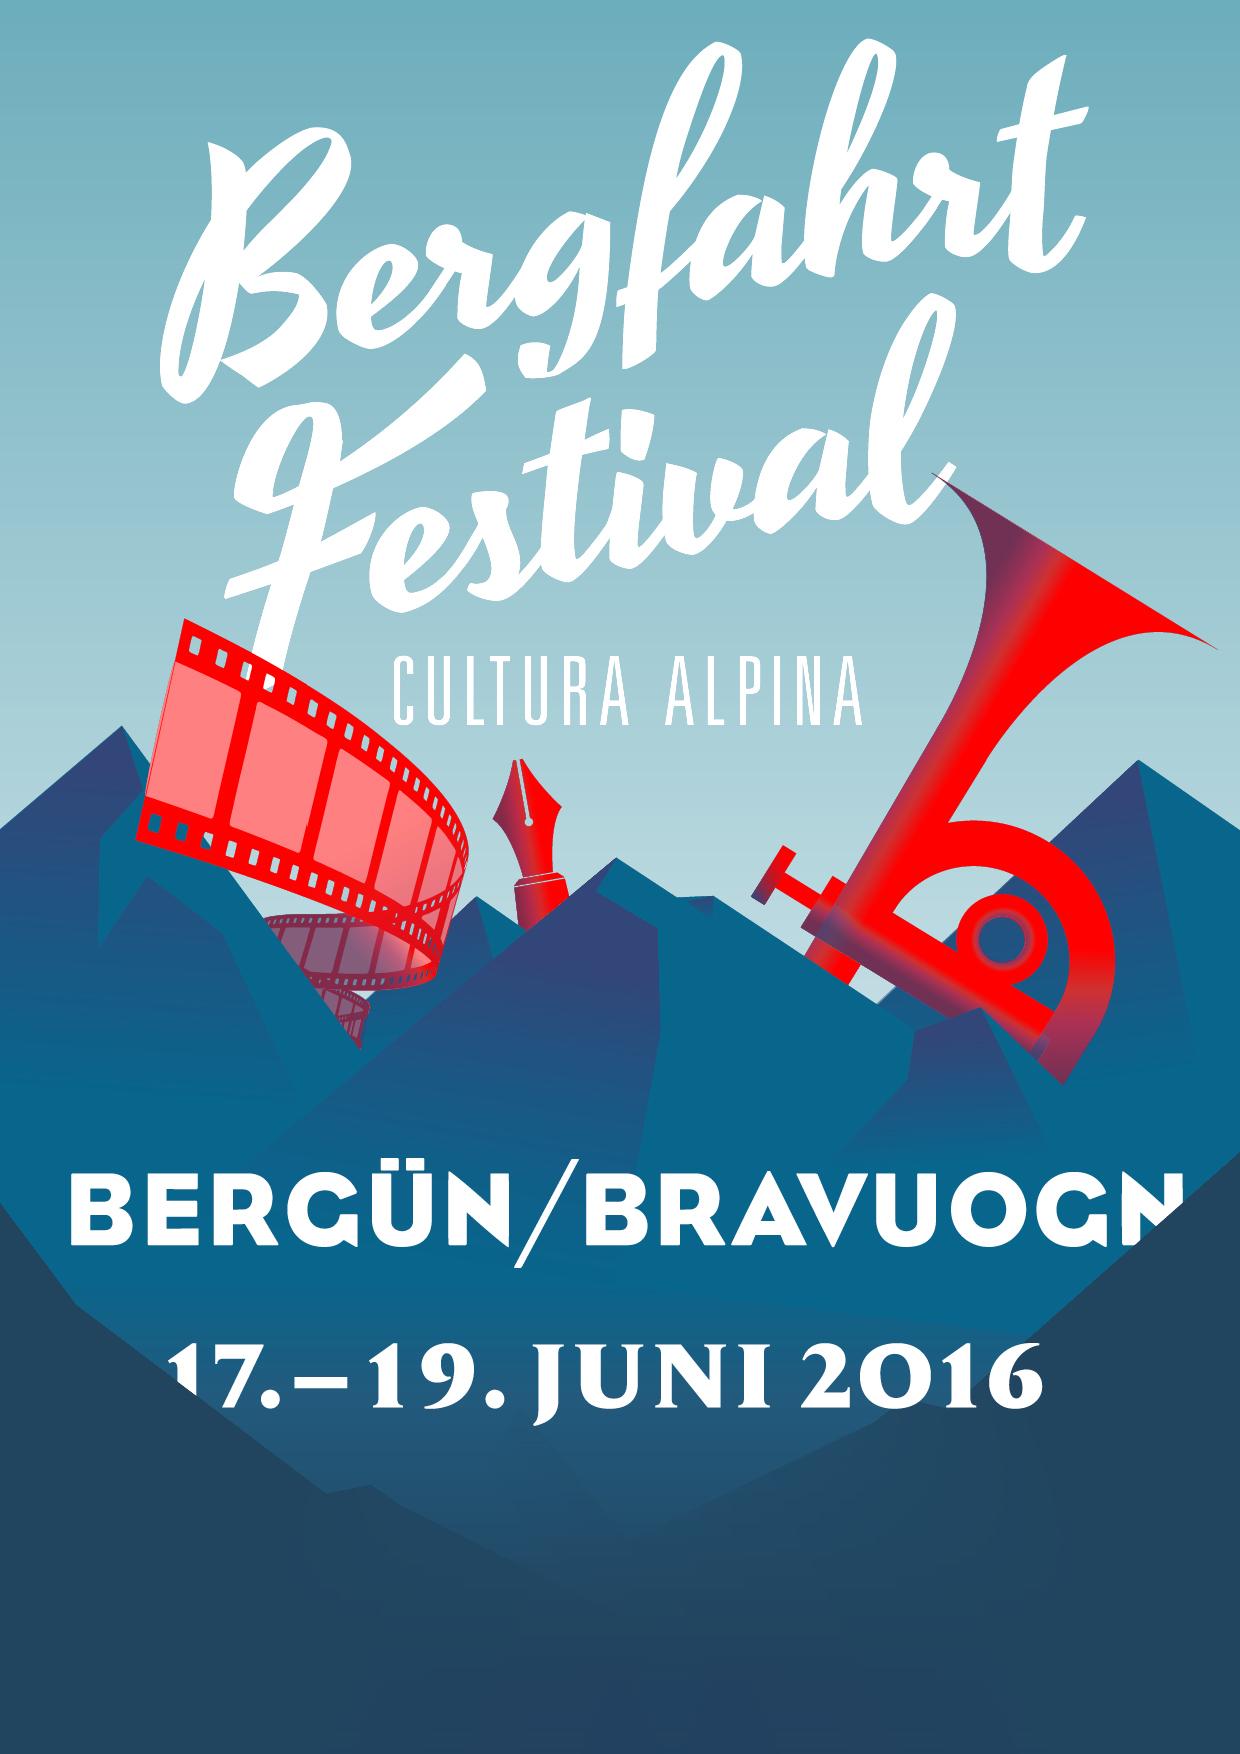 Bergfahrt Festival